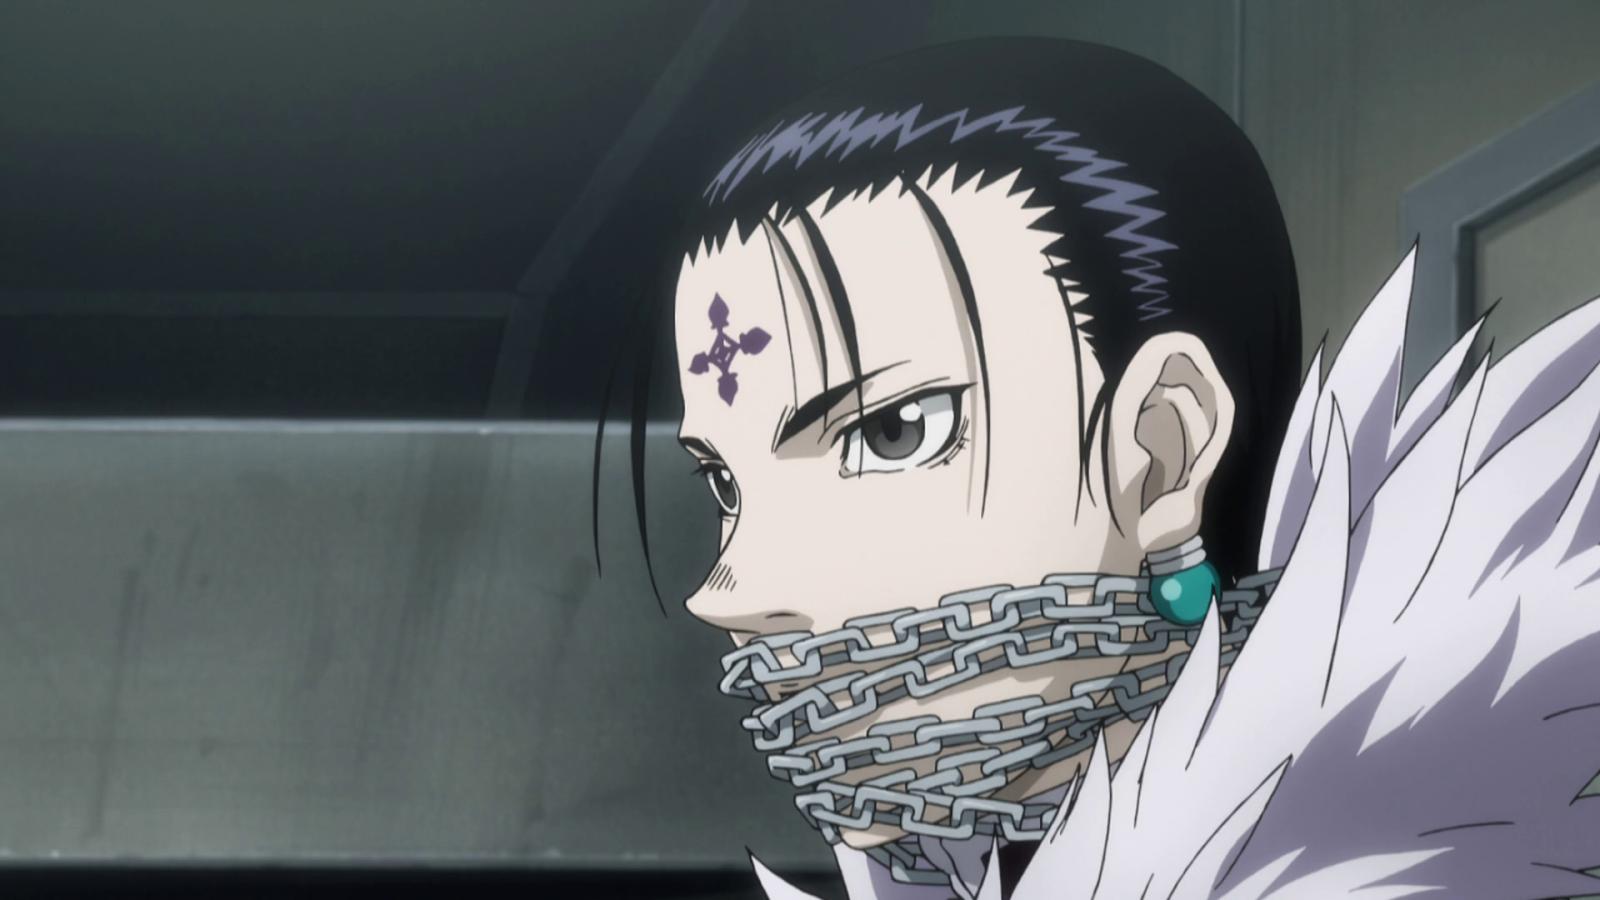 Kuroro Lucilfer Chrollo Genei Ryodan Hunter X Danchou The